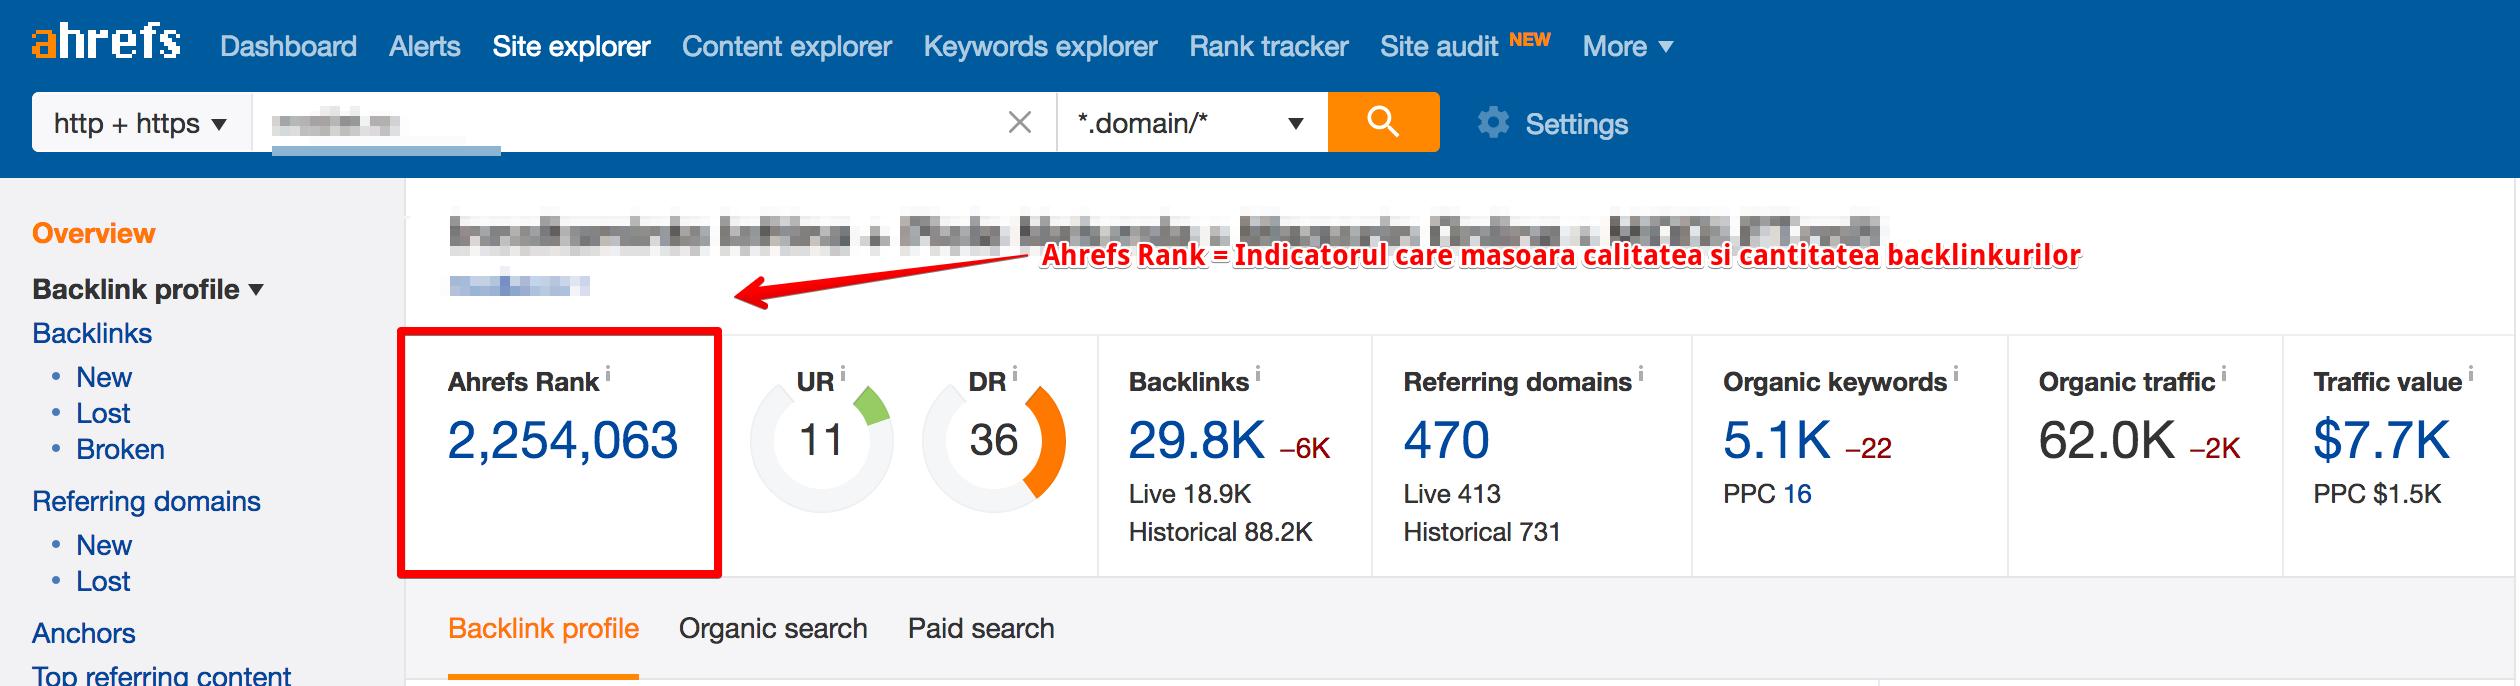 ahrefs rank - calitatea si cantitatea backlinkurilor